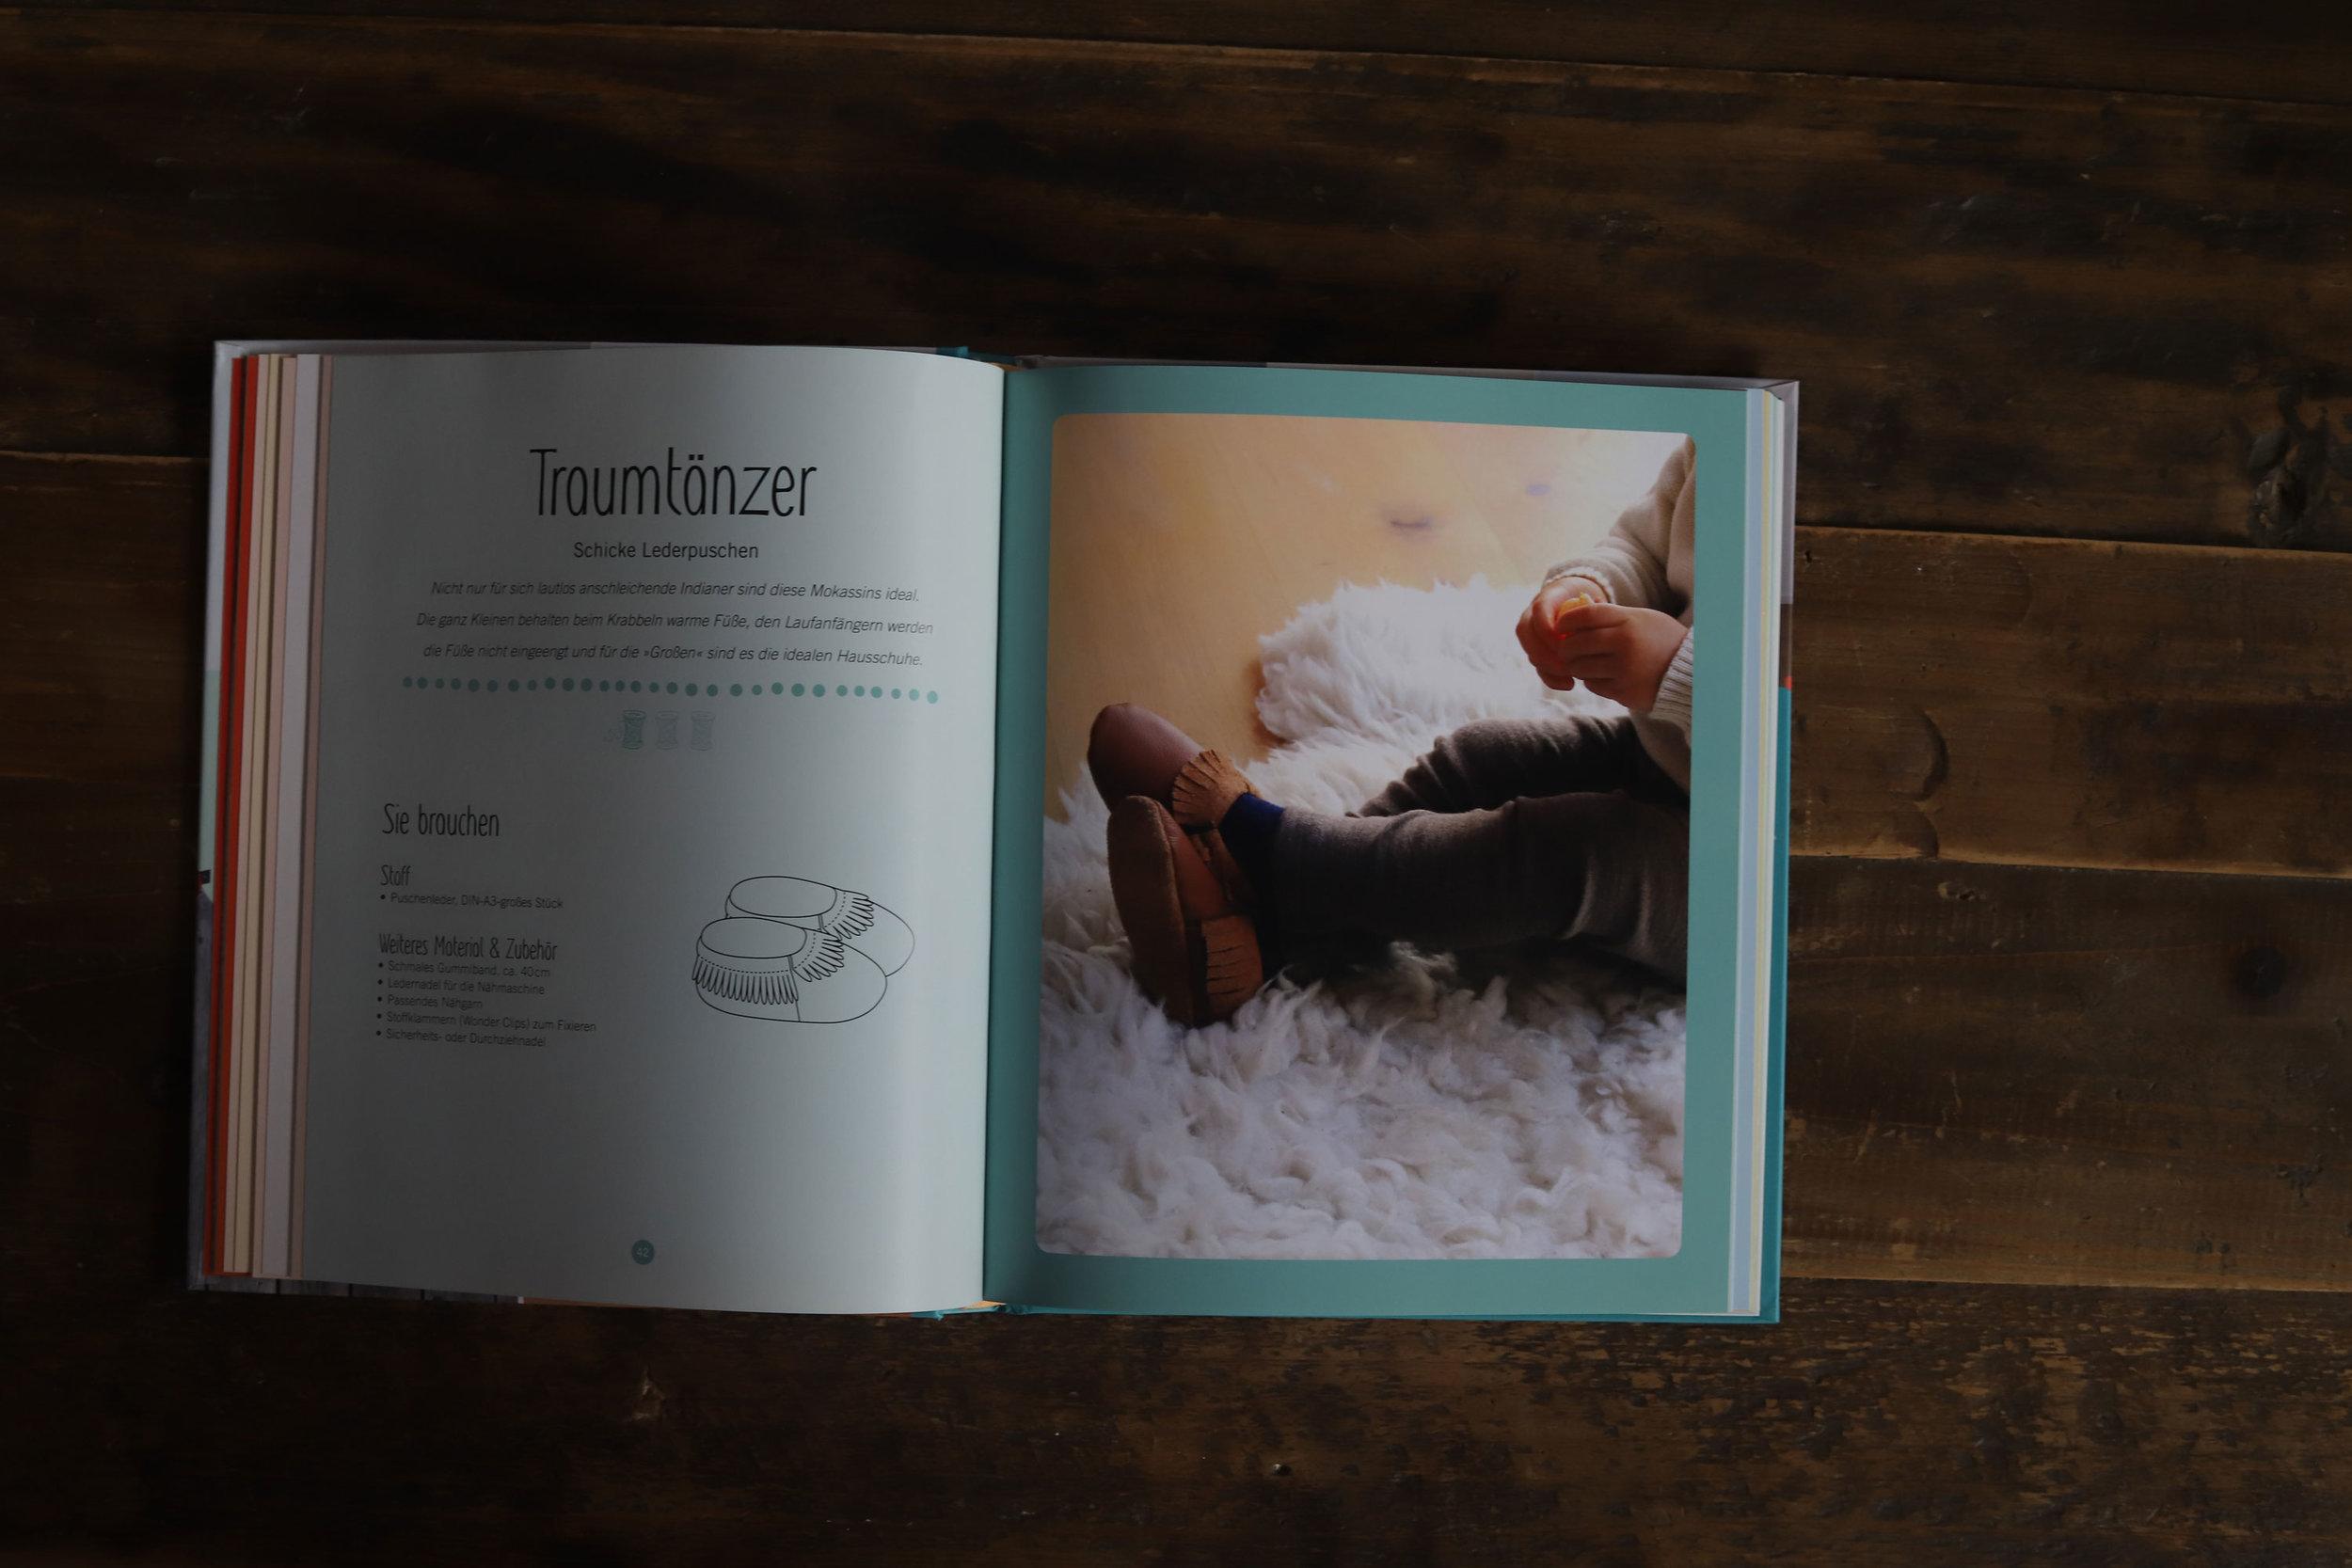 esther-meinl-zottl-produktfotografie-22.jpg